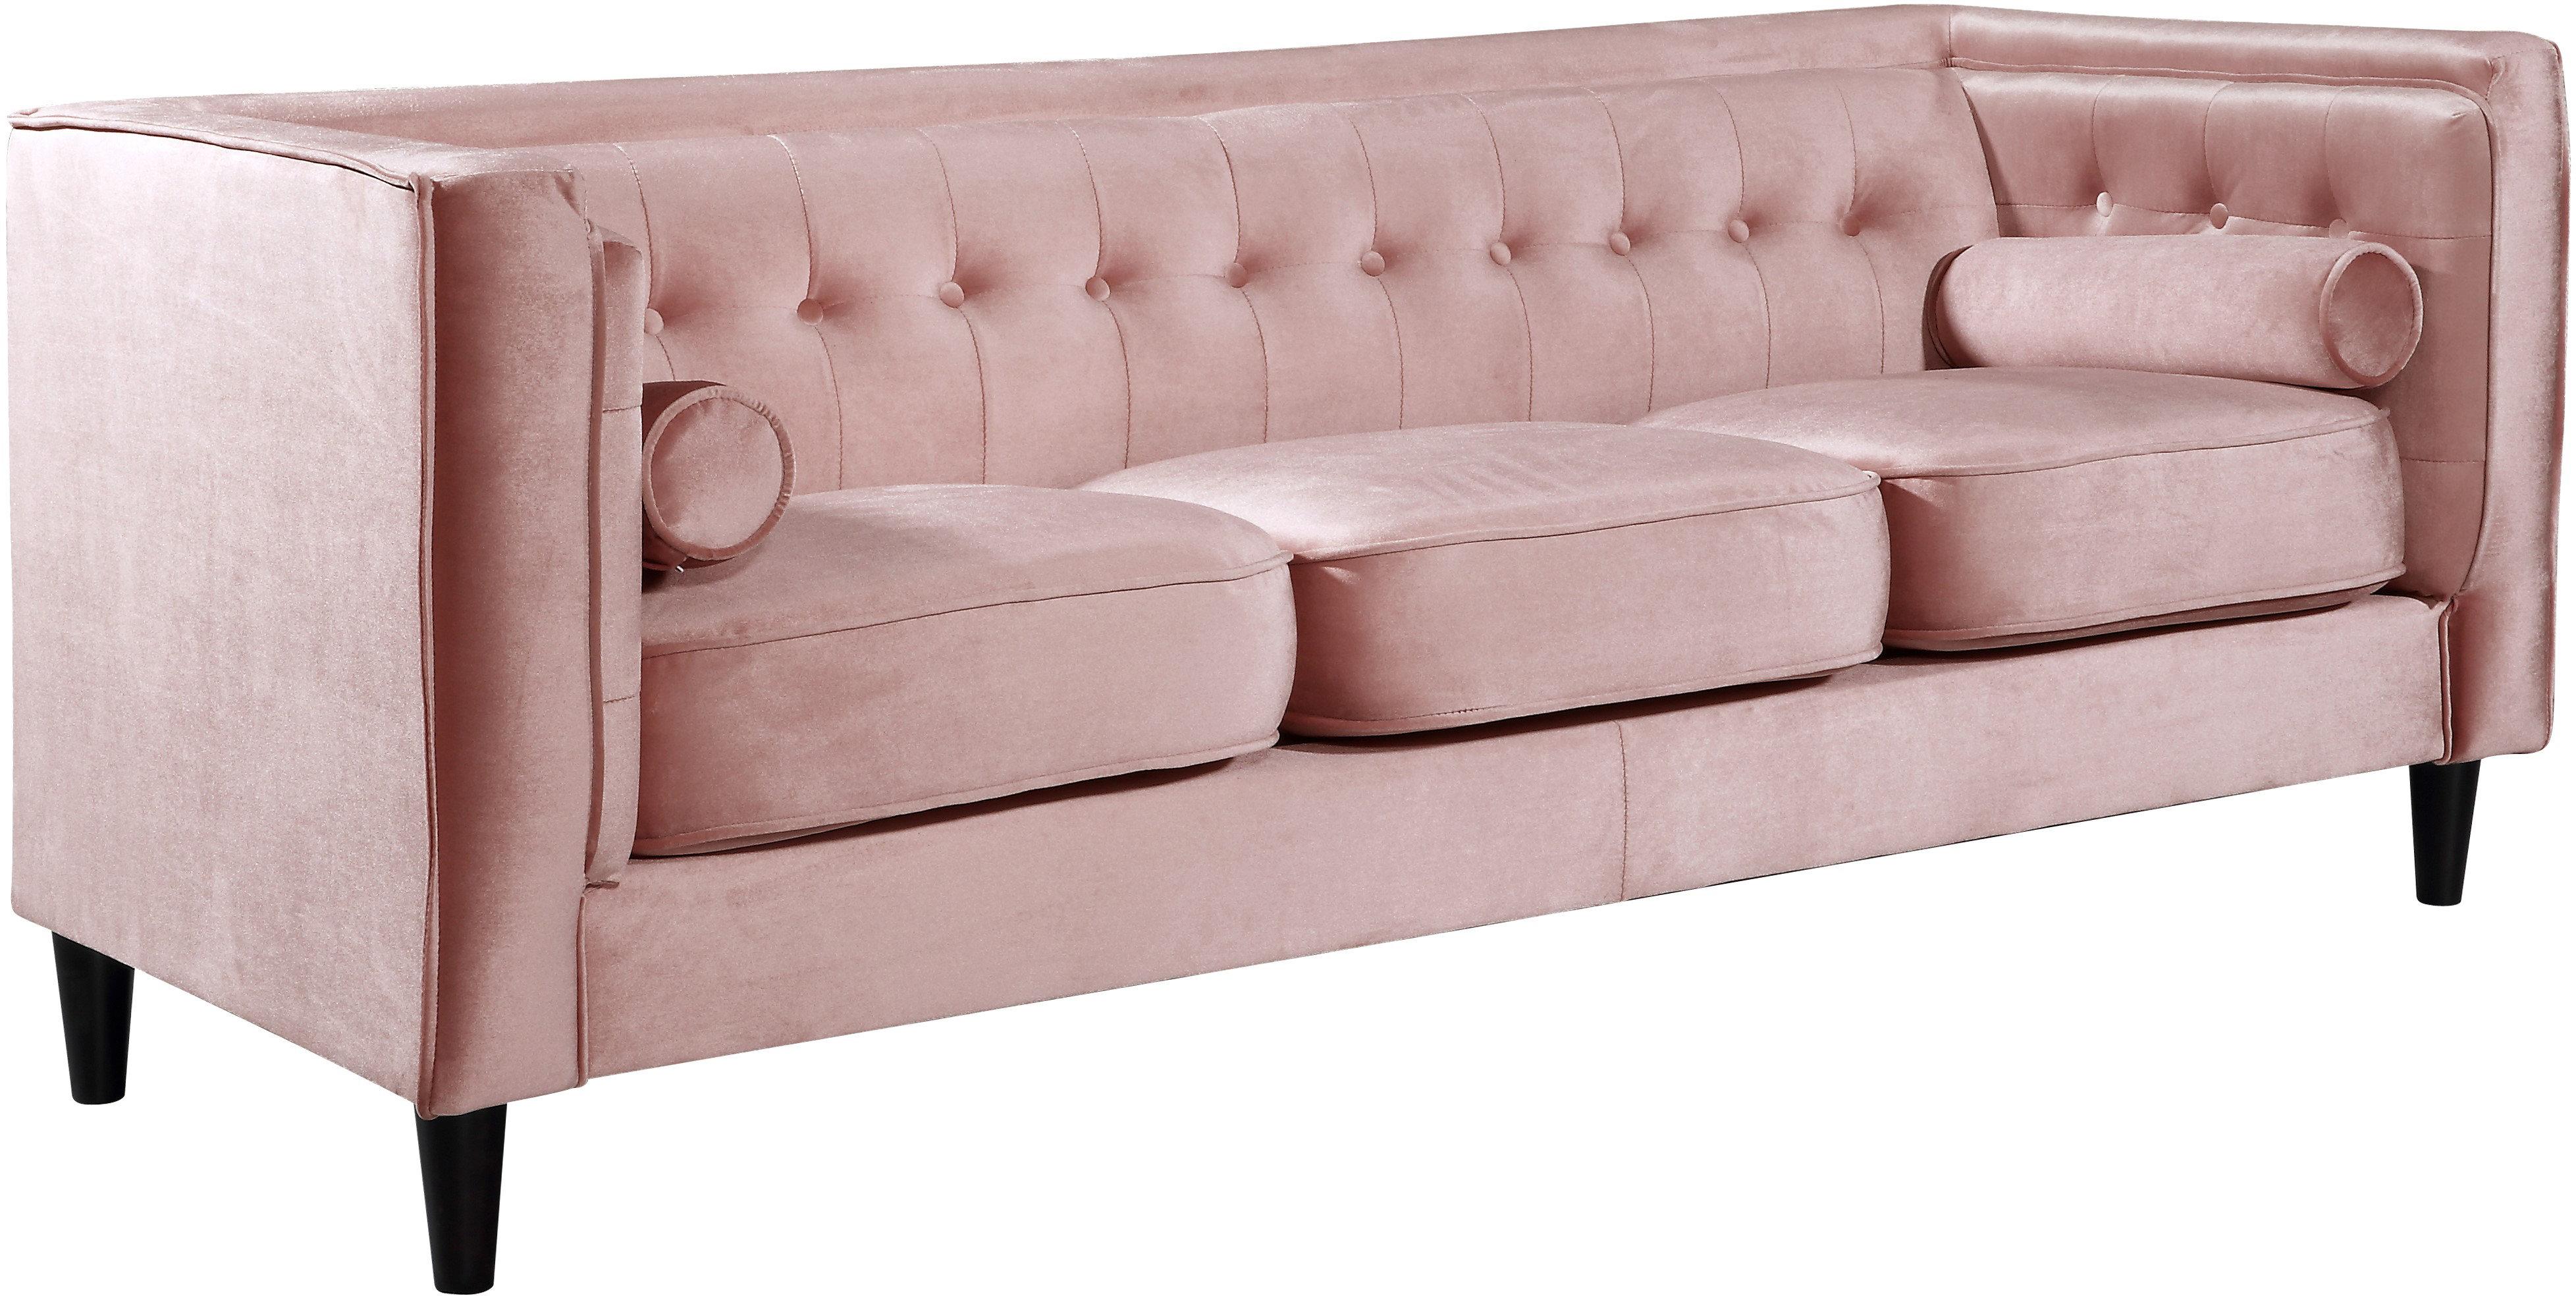 Willa Arlo Interiors Roberta 84 Wide Velvet Tuxedo Arm Sofa Reviews Wayfair